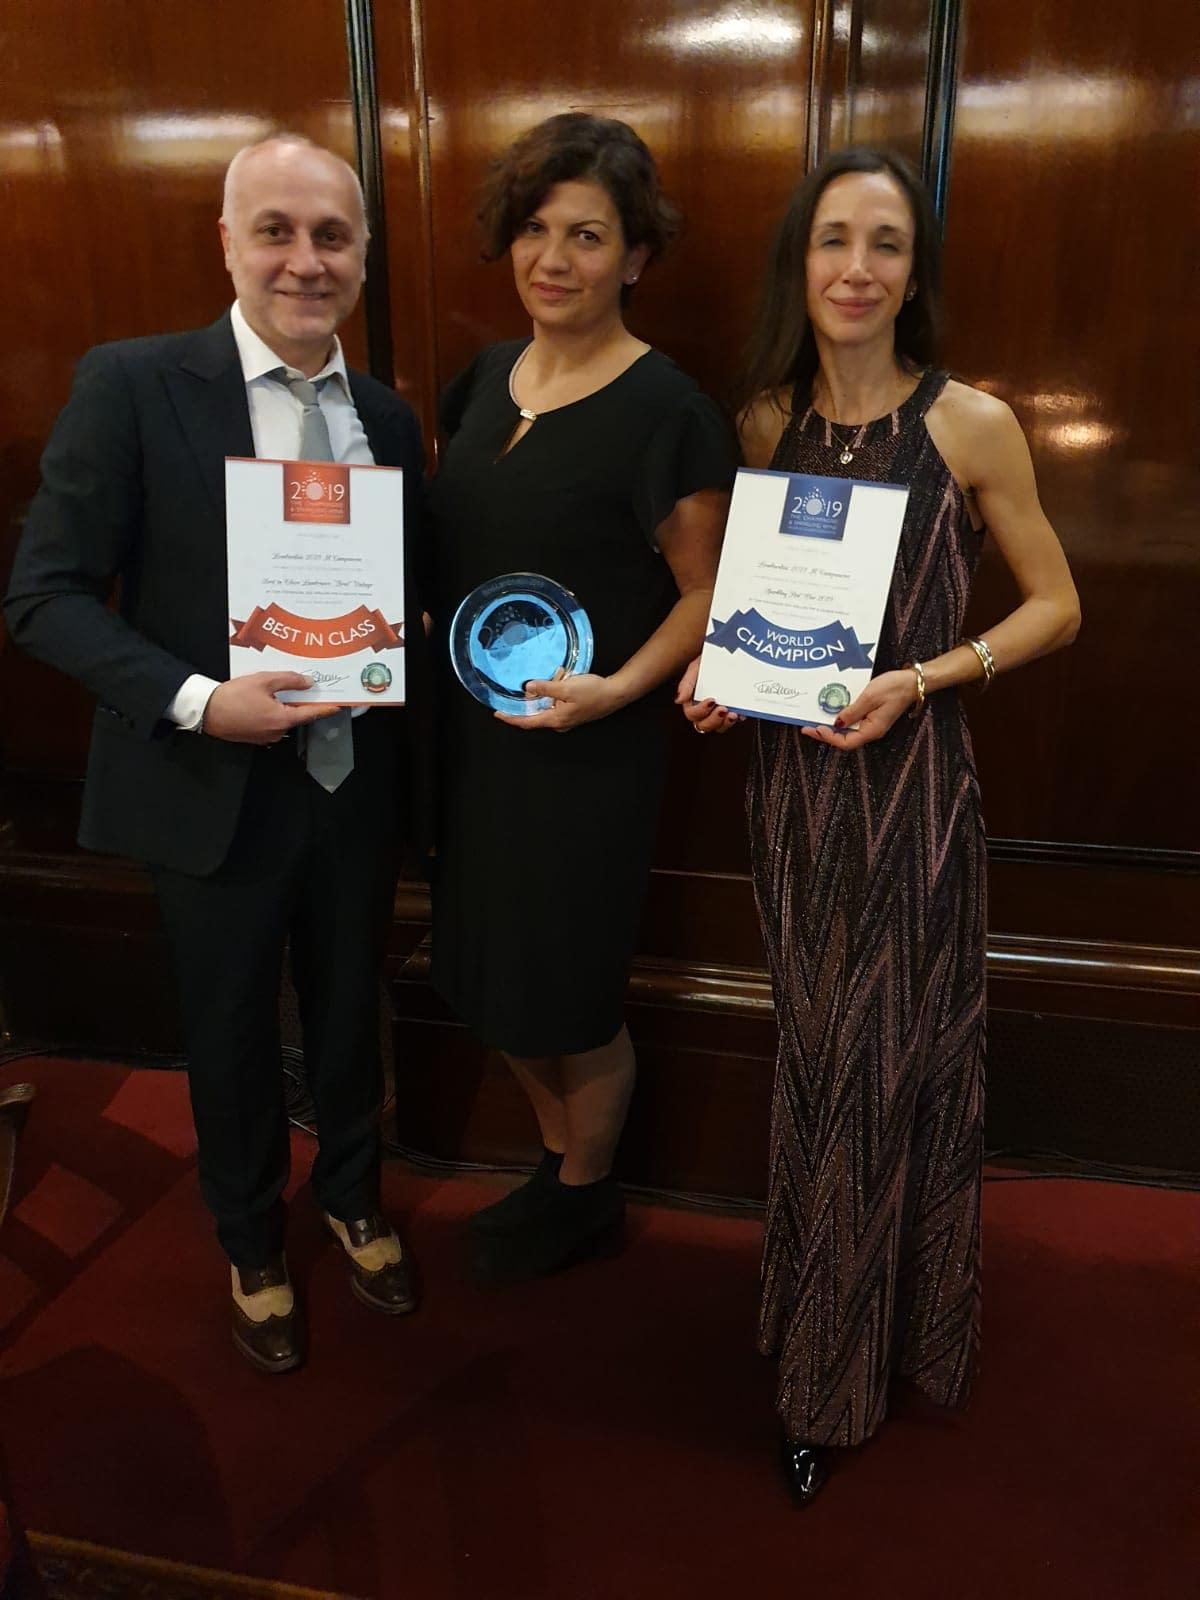 Nadia Iacovelli and Mirko Kusturin with the winner of the World Champion Sparkling Red Wine 2019 - Lombardini 2018 Il Campanone